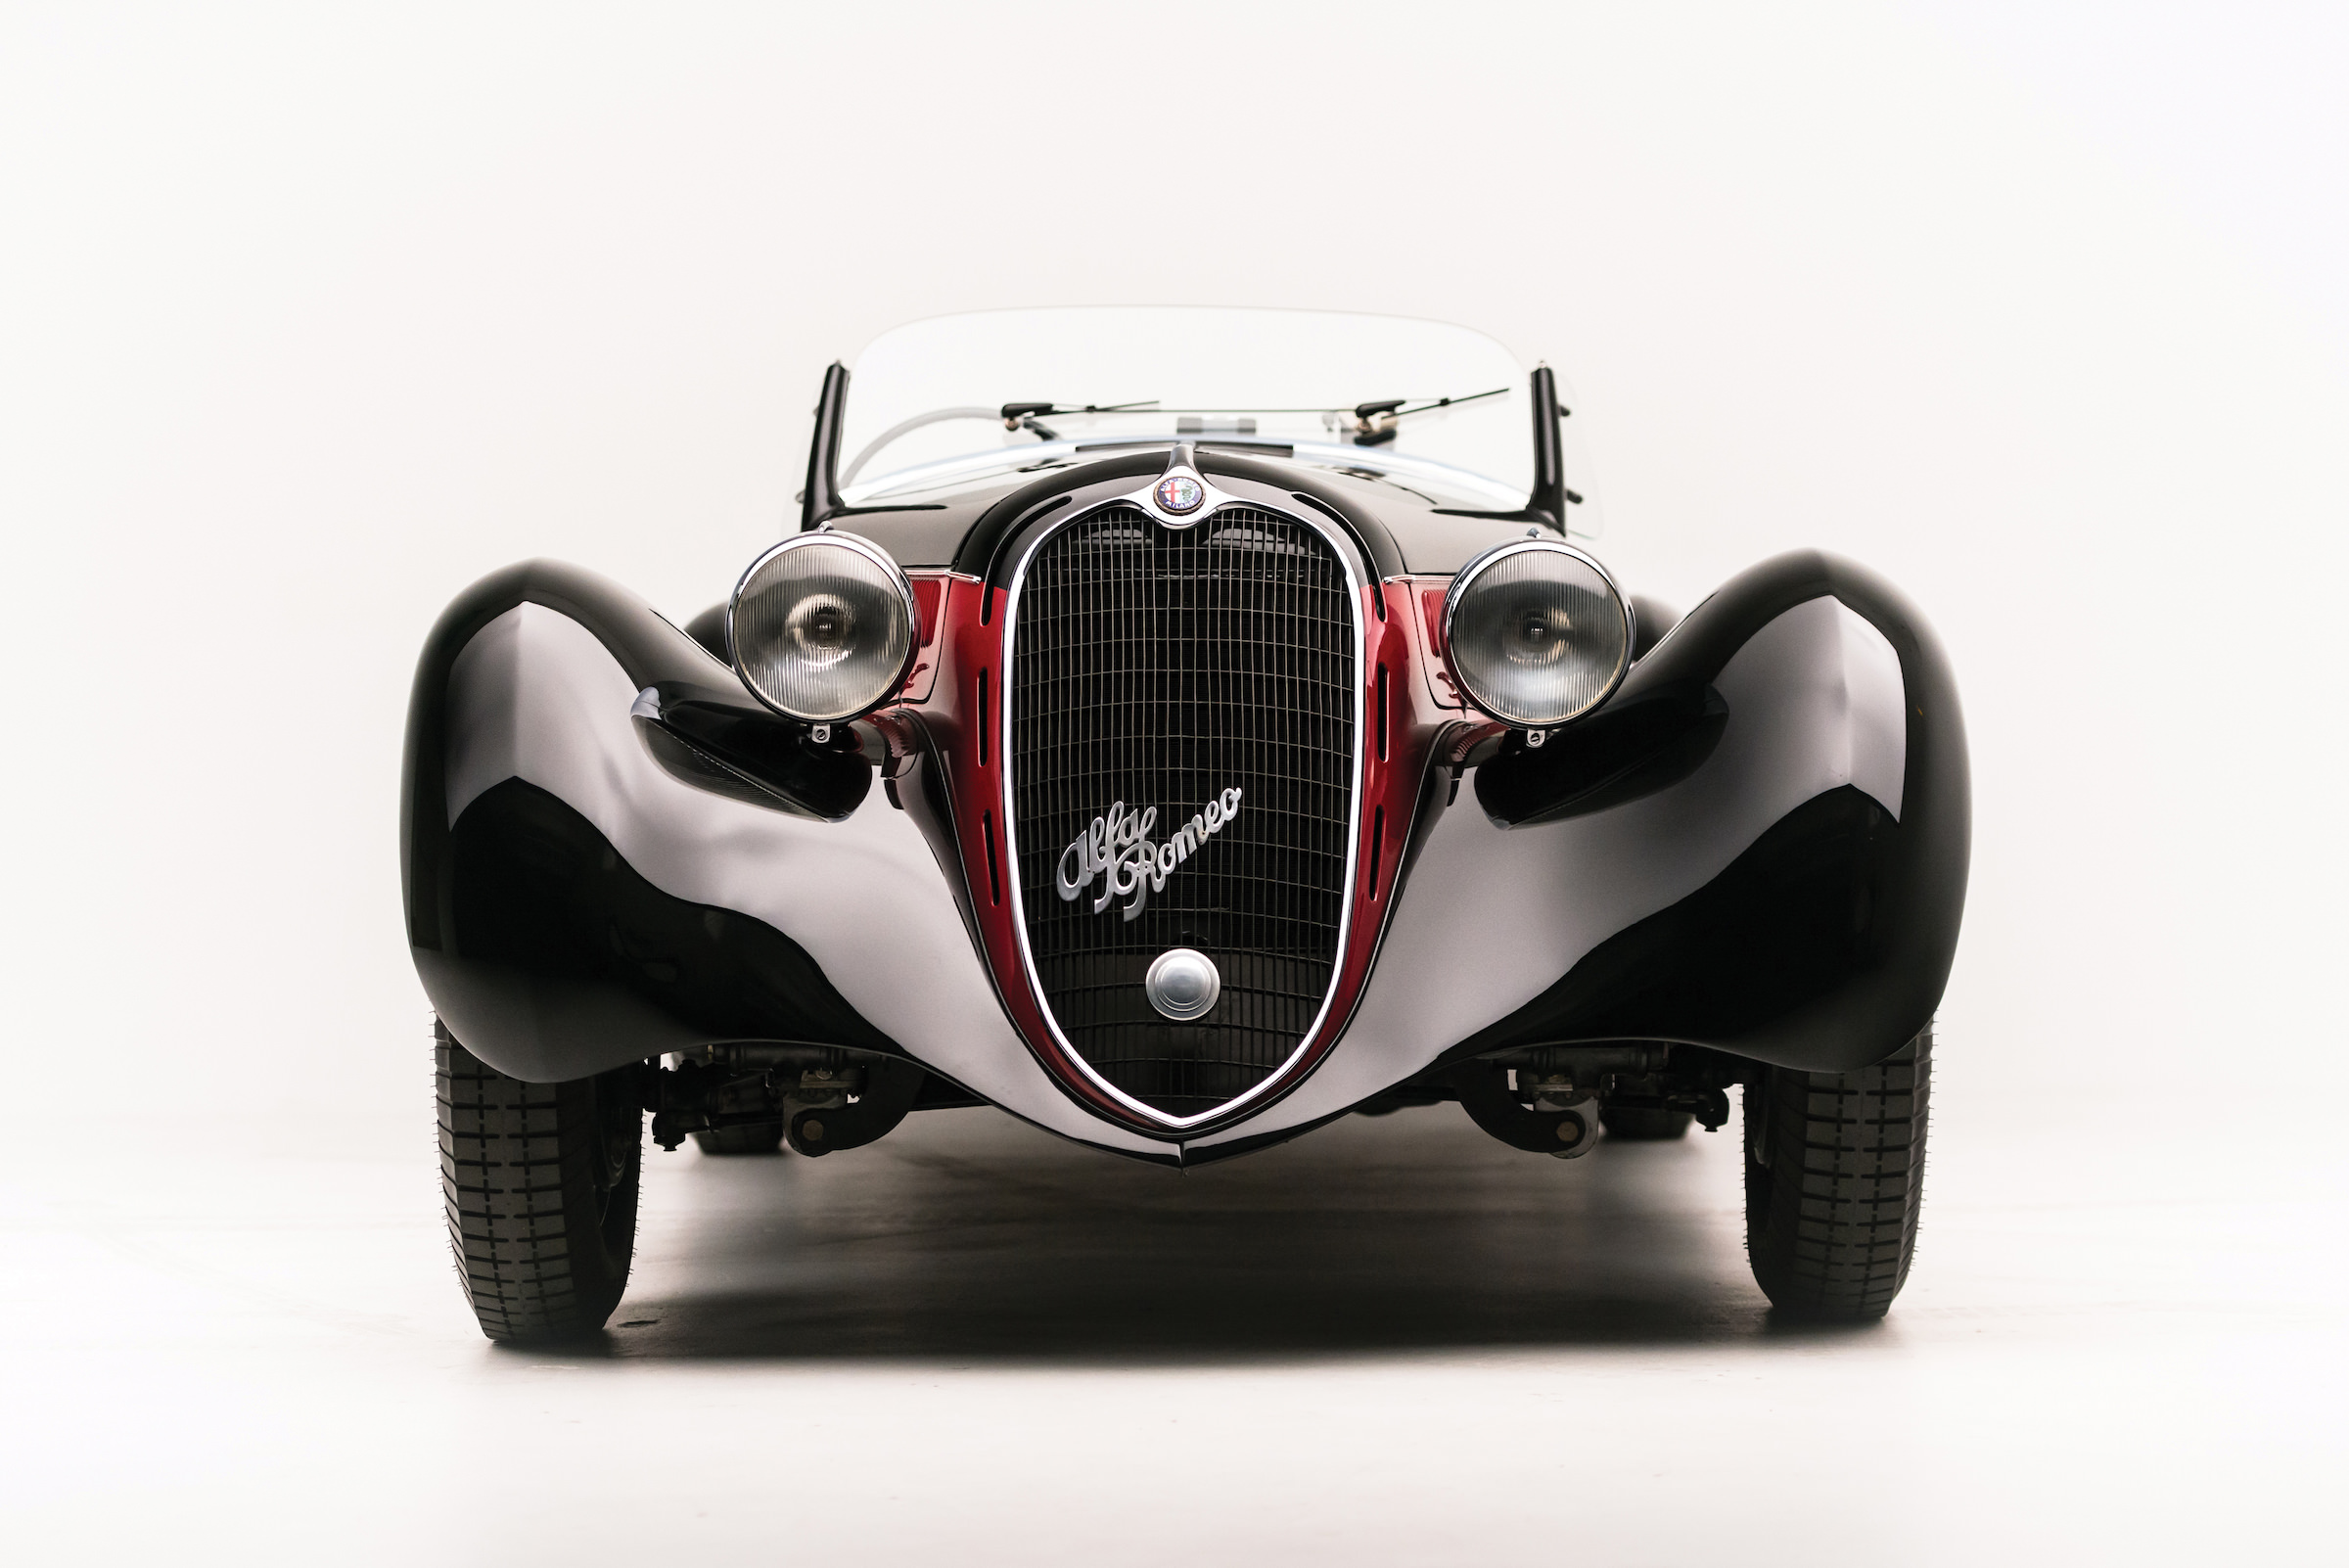 1942 alfa romeo 6c 2500 ss spider. Black Bedroom Furniture Sets. Home Design Ideas